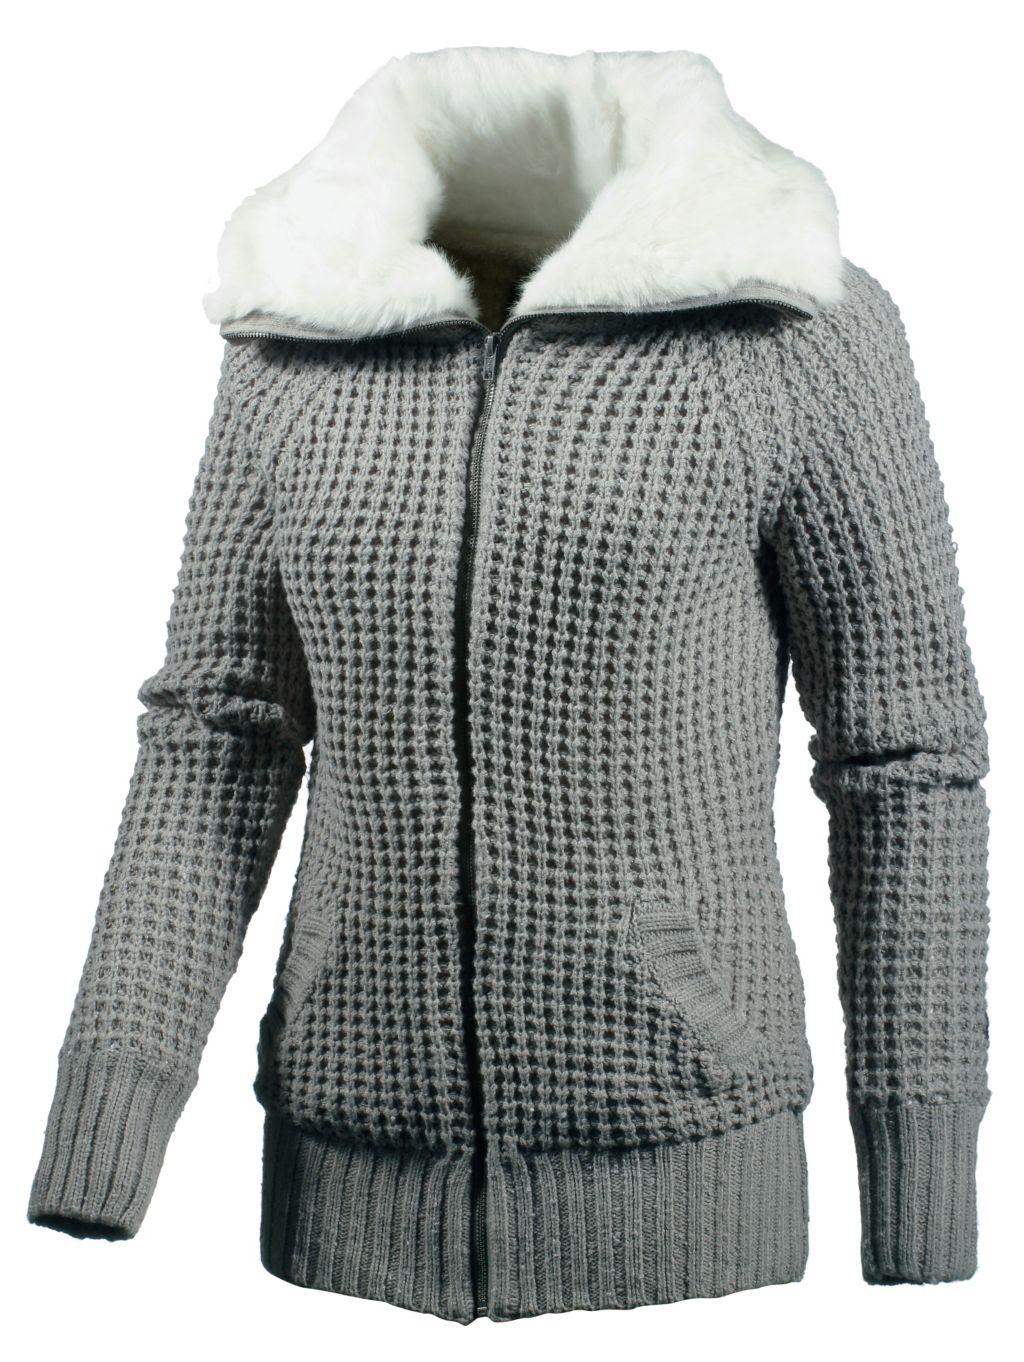 Strickjacke Damen in grau, Größe XL